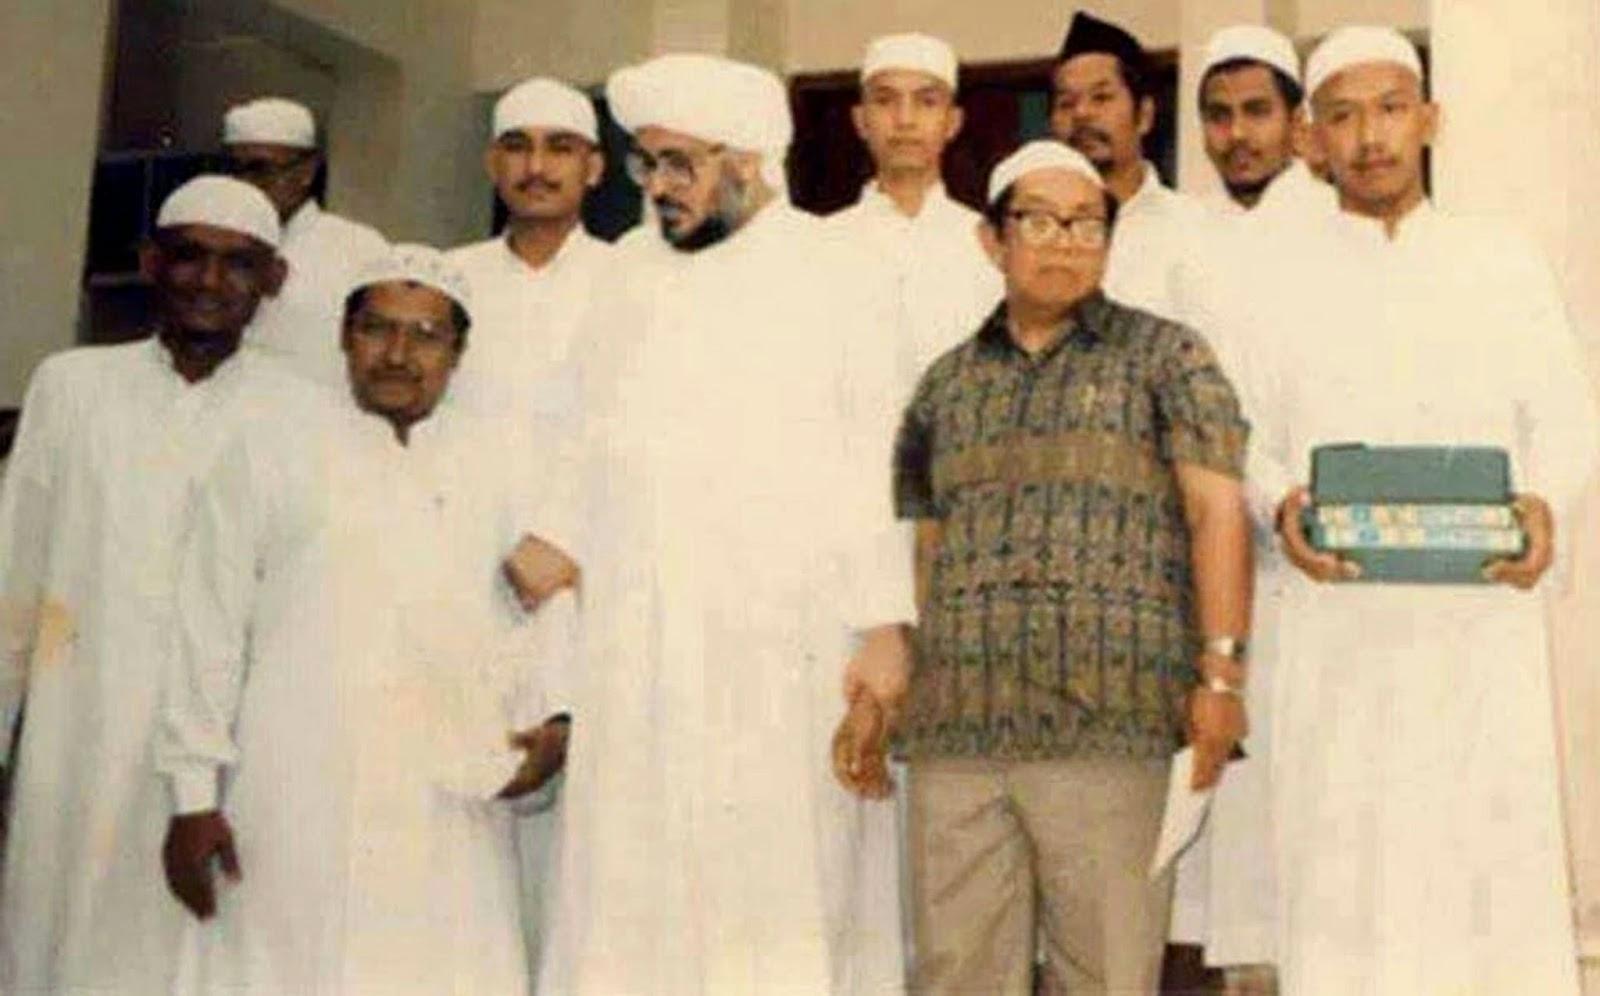 Sayyid Muhammad bin Alawi al-Maliki Menggandeng KH. Abdurrahman Wahid dan KH. Said Aqil Siroj